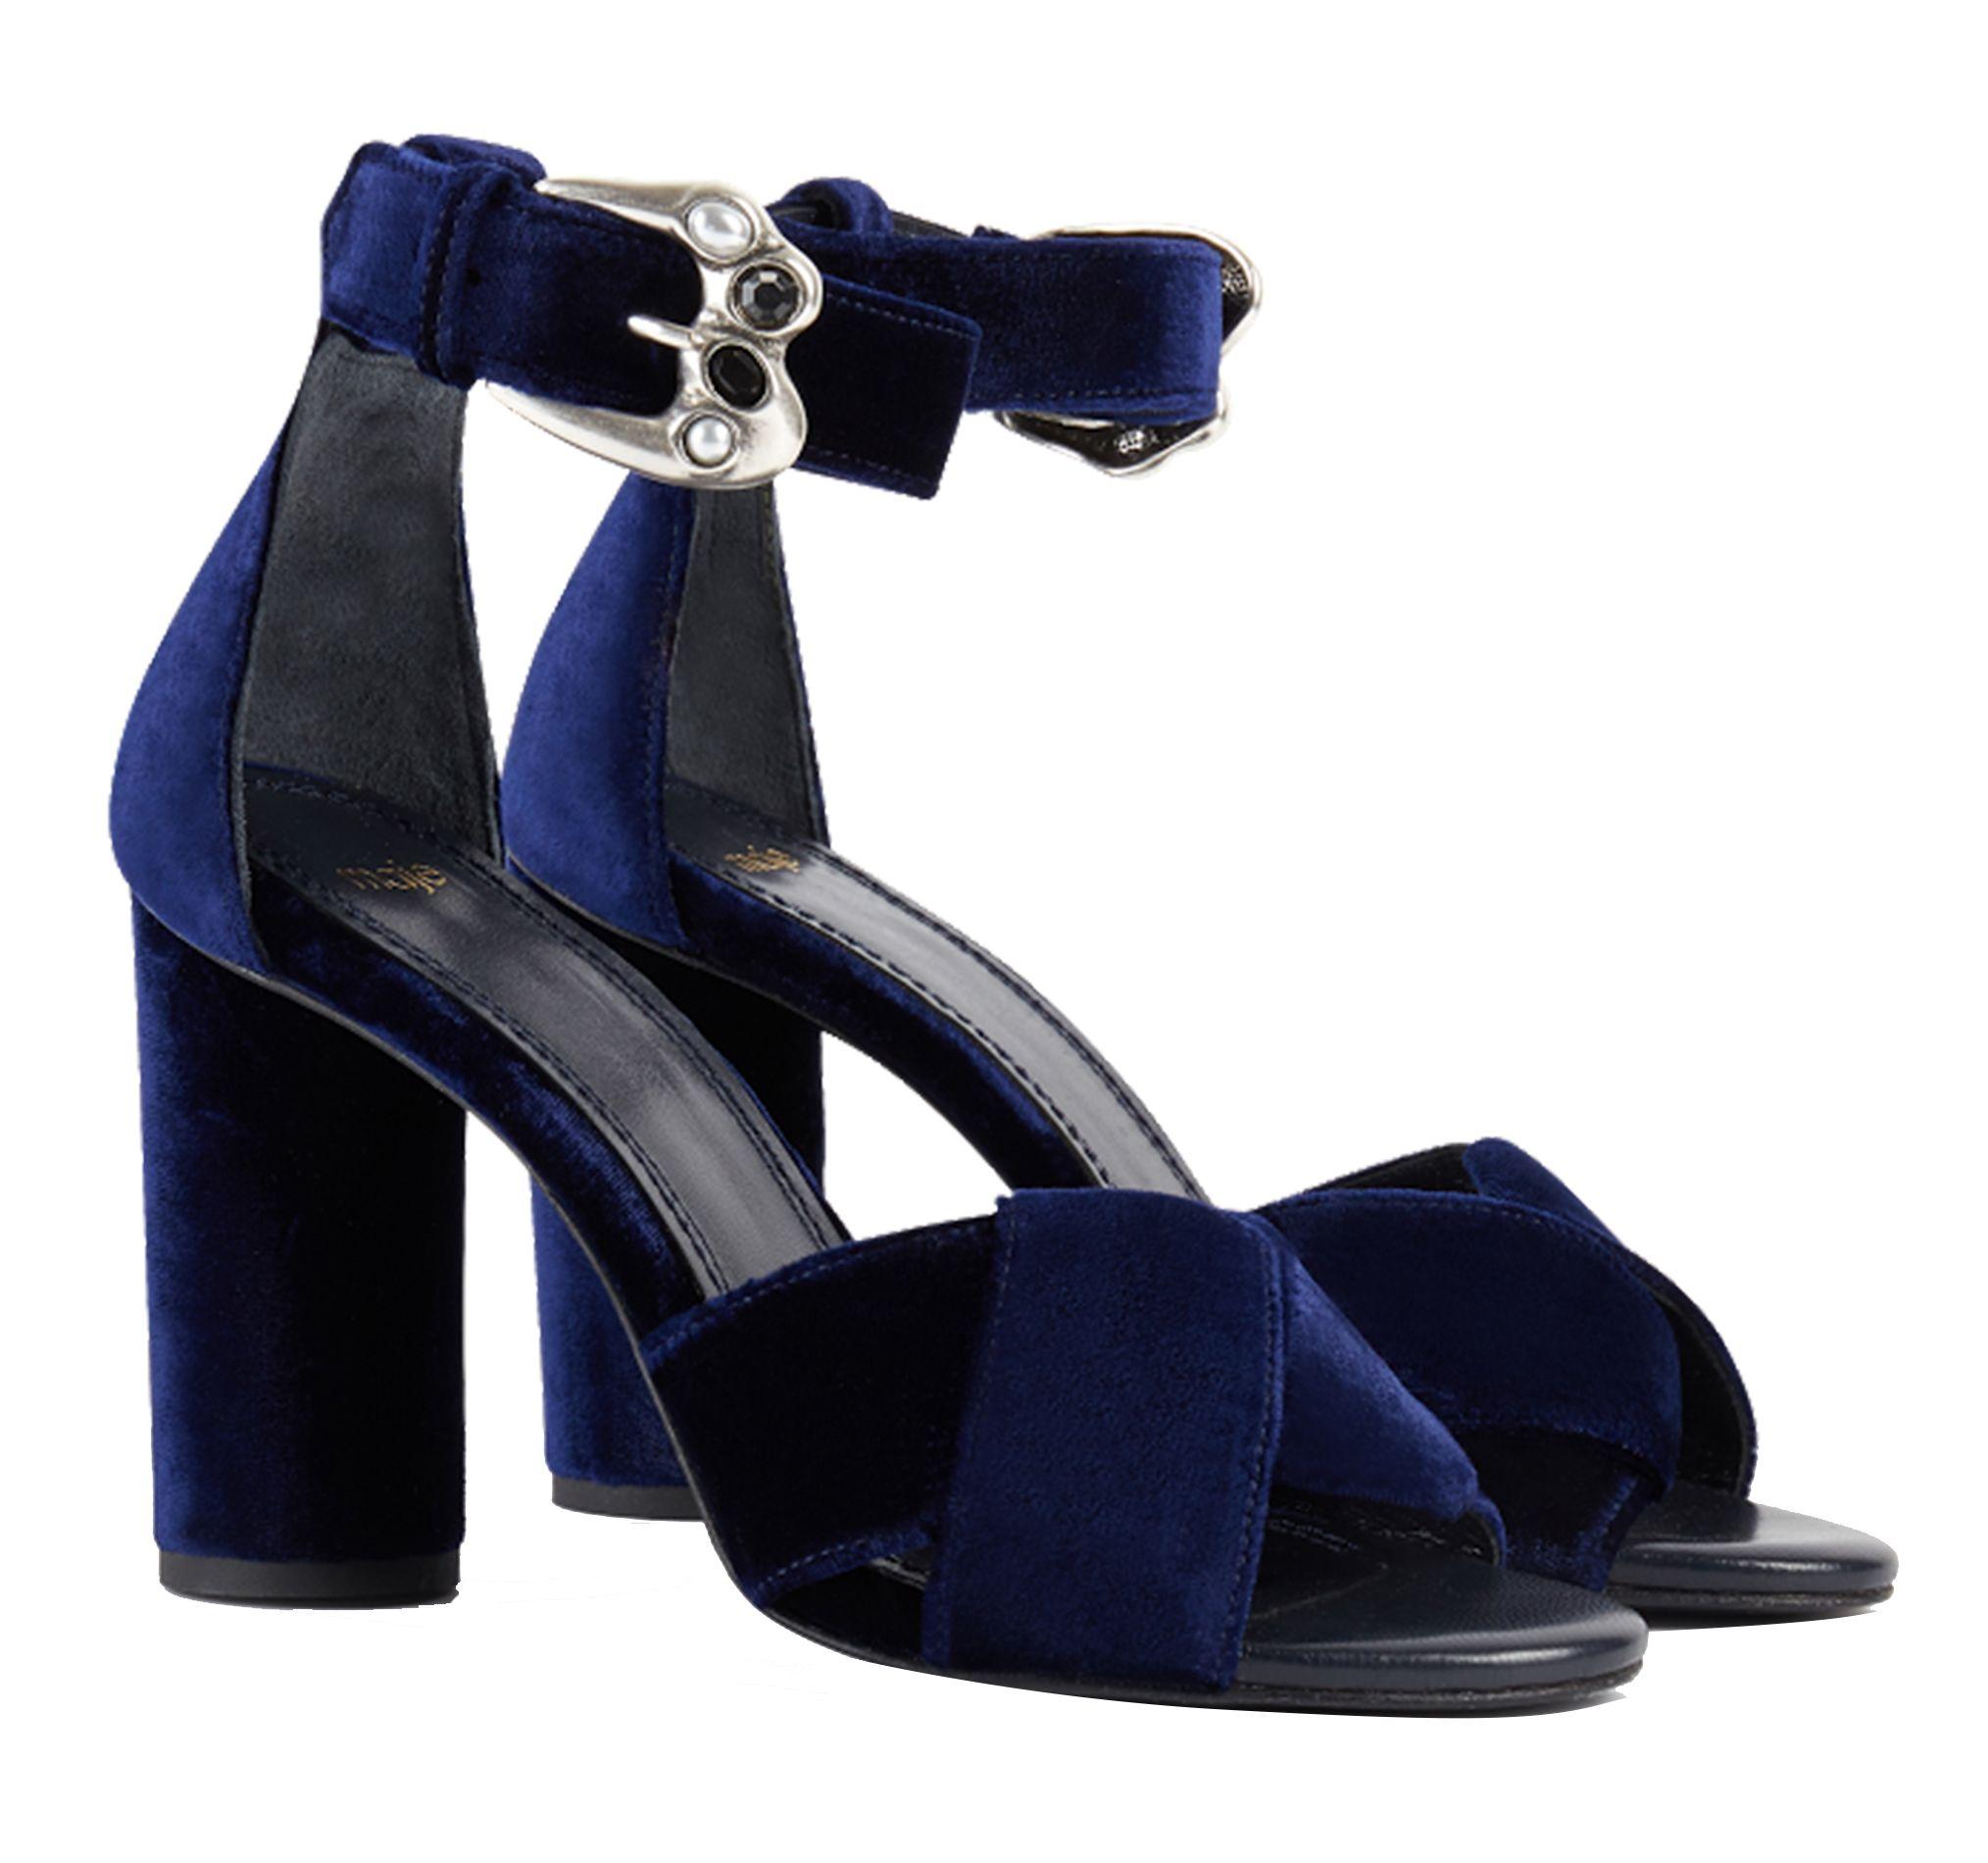 Maje Velours Bleu Femme Avec Boucles Eboutique En Falbe Sandales 8vNwnmOy0